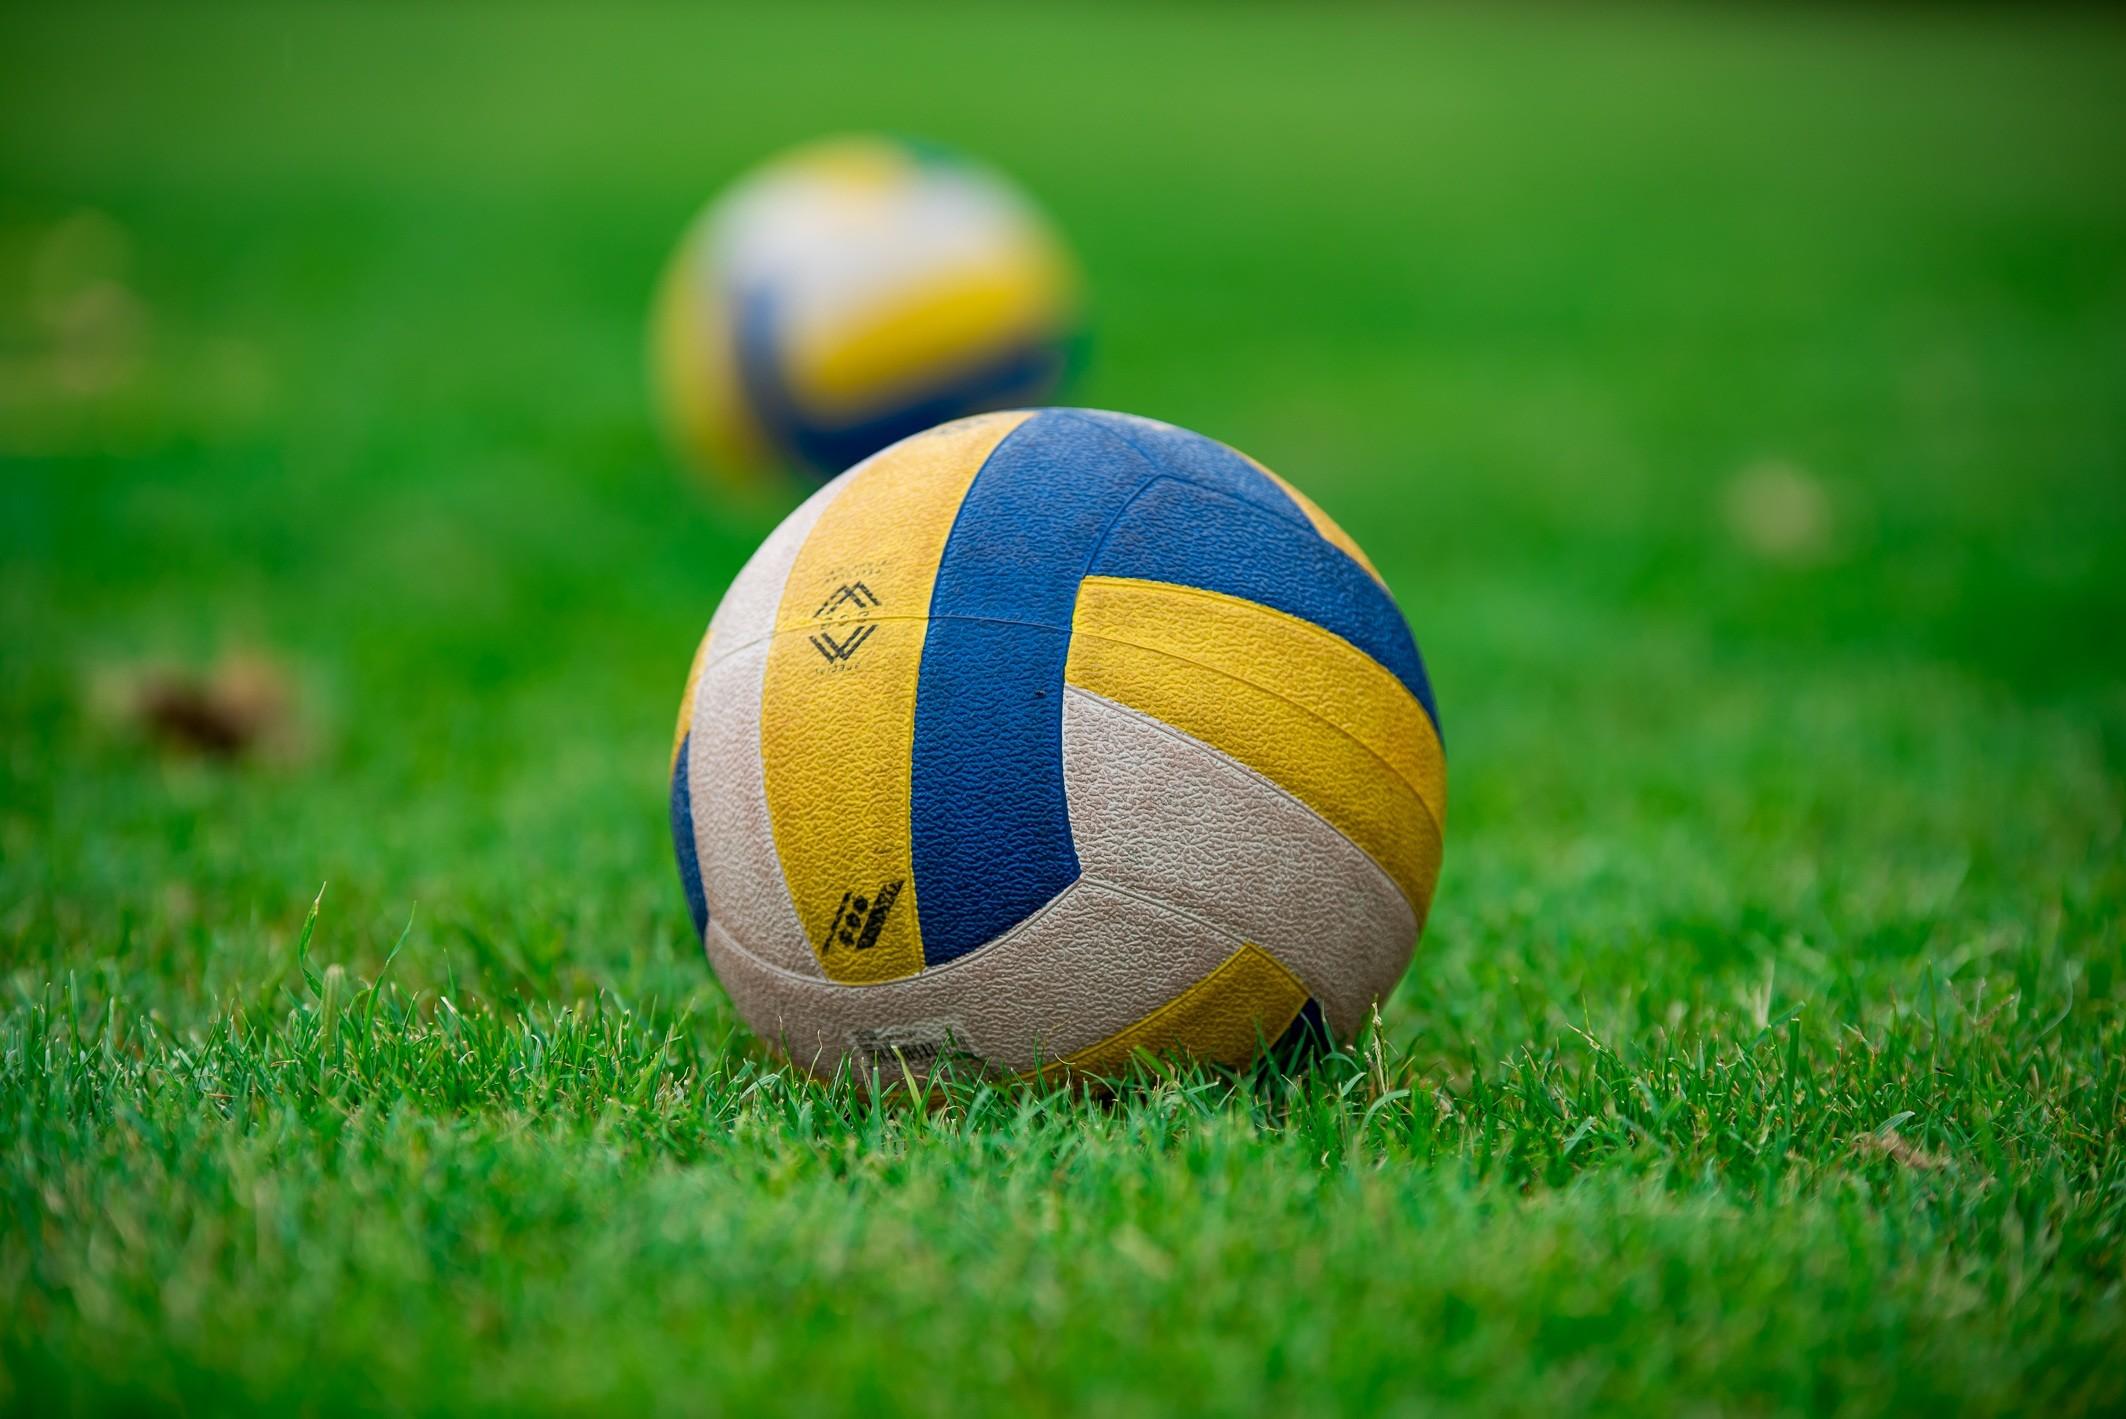 grass plant sport field lawn play equipment soccer yellow football player  sports ball volleyball pallone football